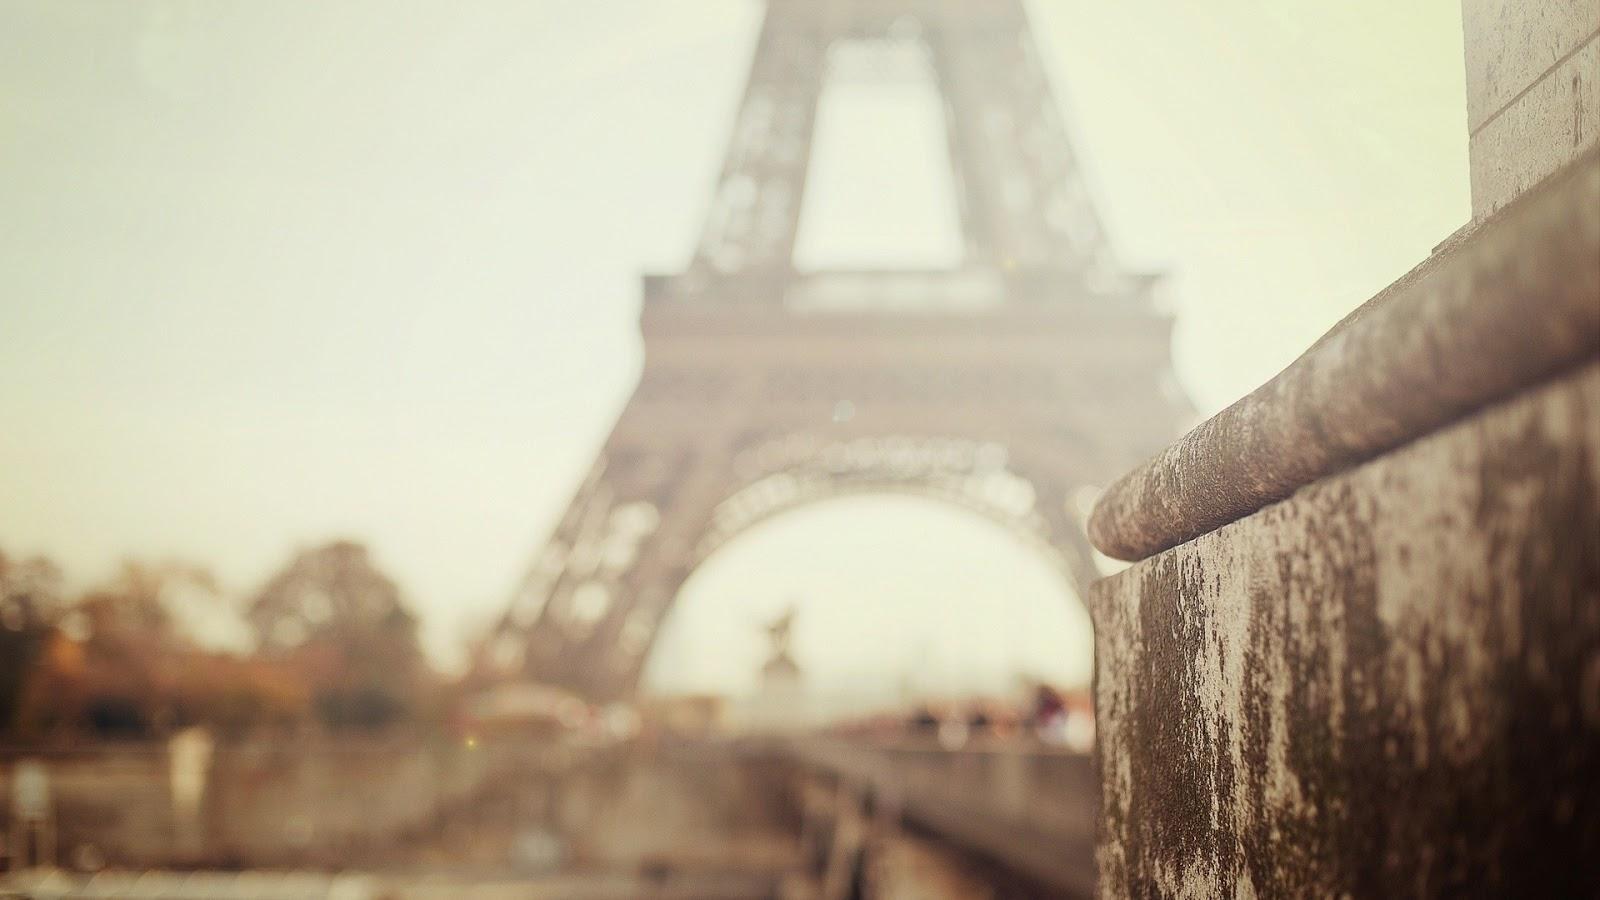 Morning in Paris City